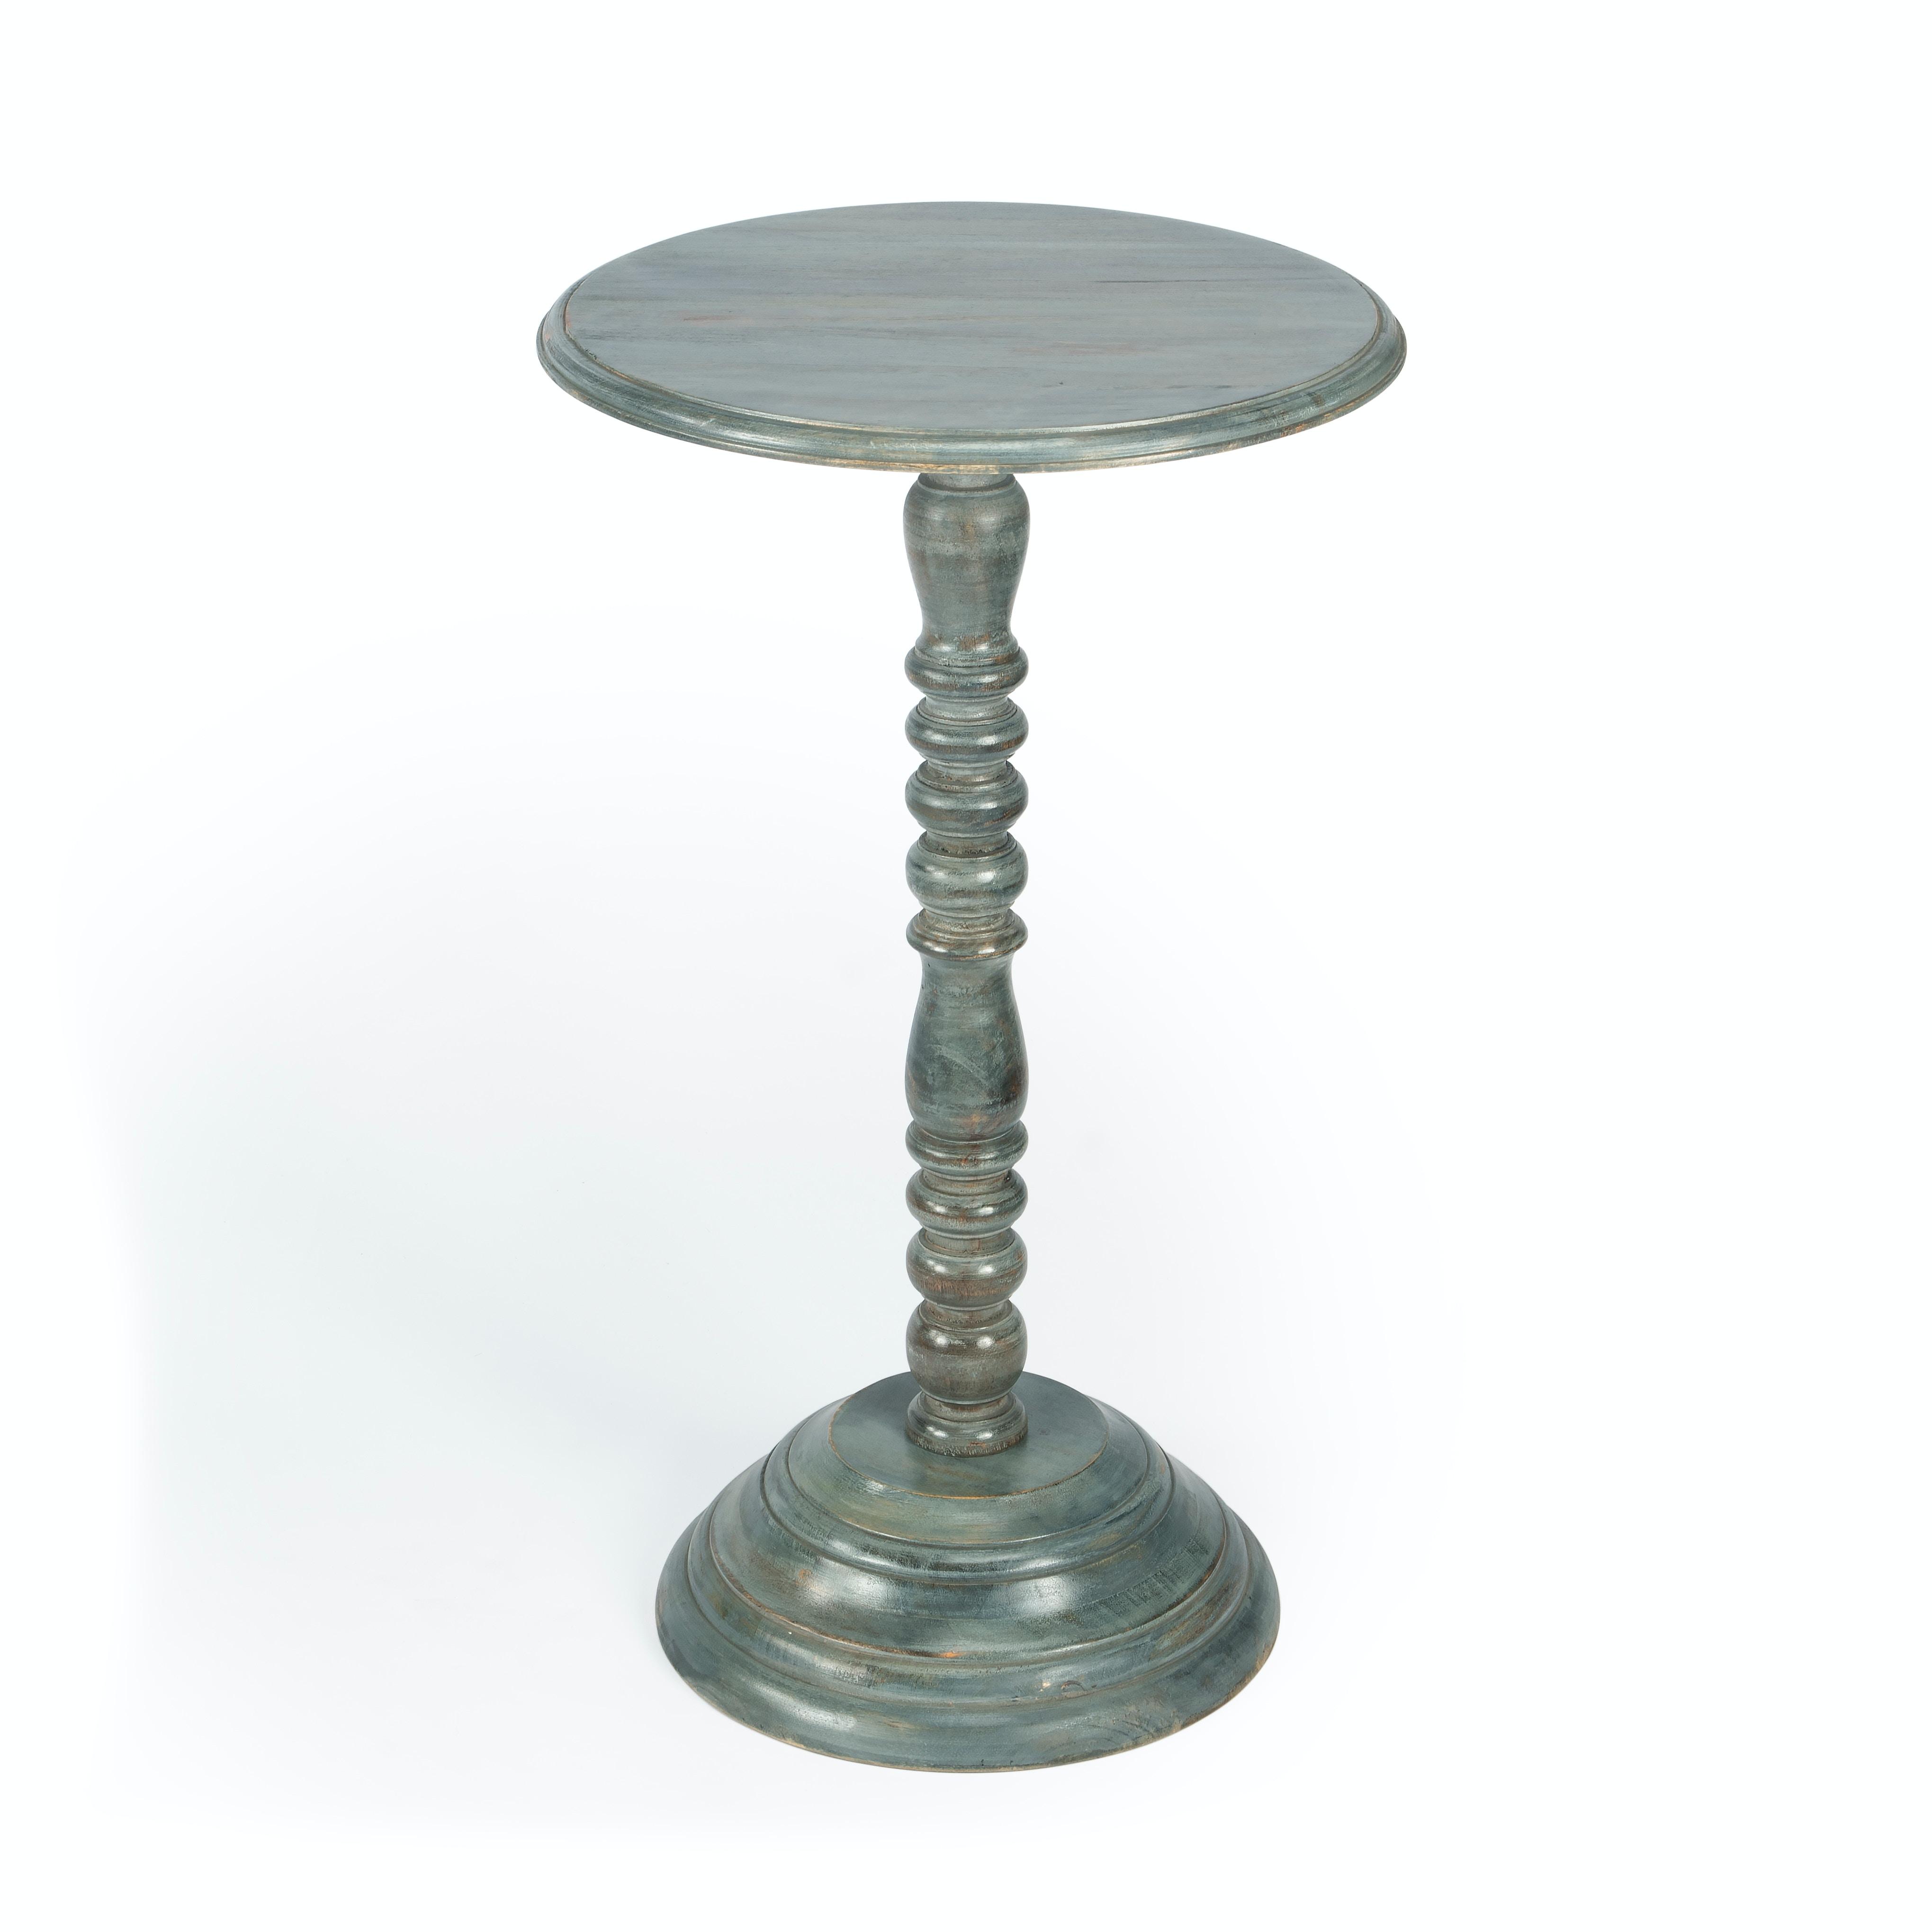 Merveilleux Butler Specialty Company Pedestal Accent Table BU2265290 From Walter E.  Smithe Furniture + Design